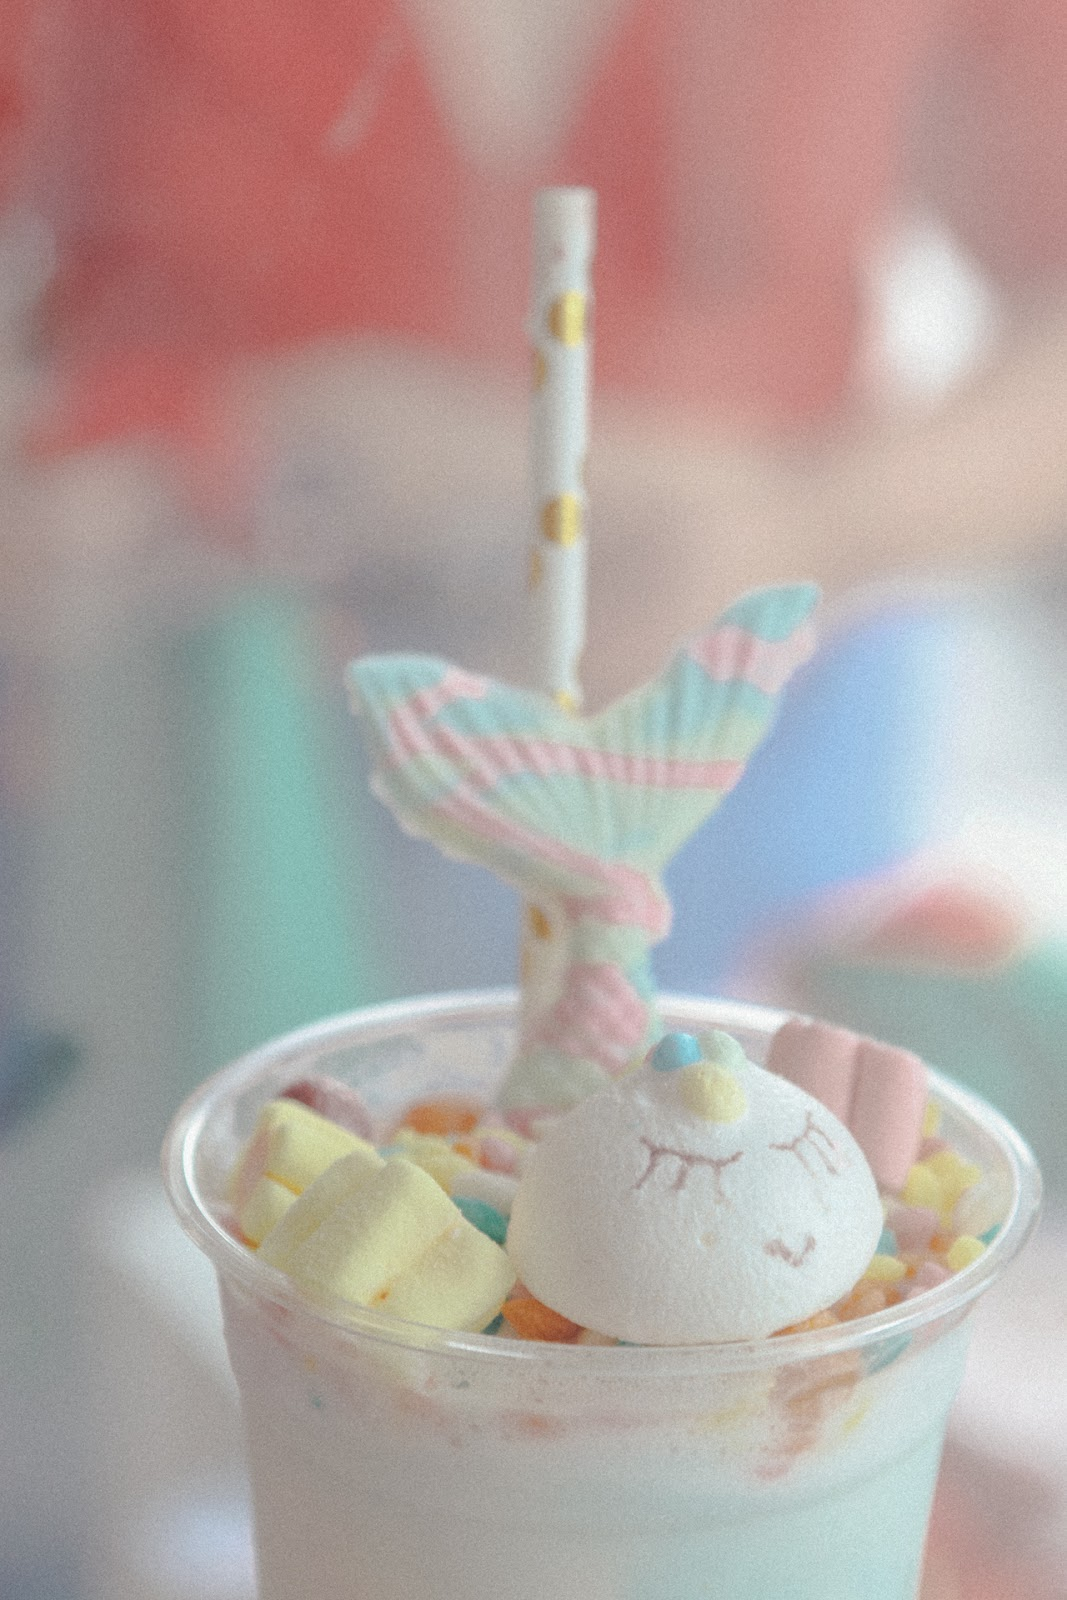 Magical Mericorn Milkshake by Chubbee Cloud